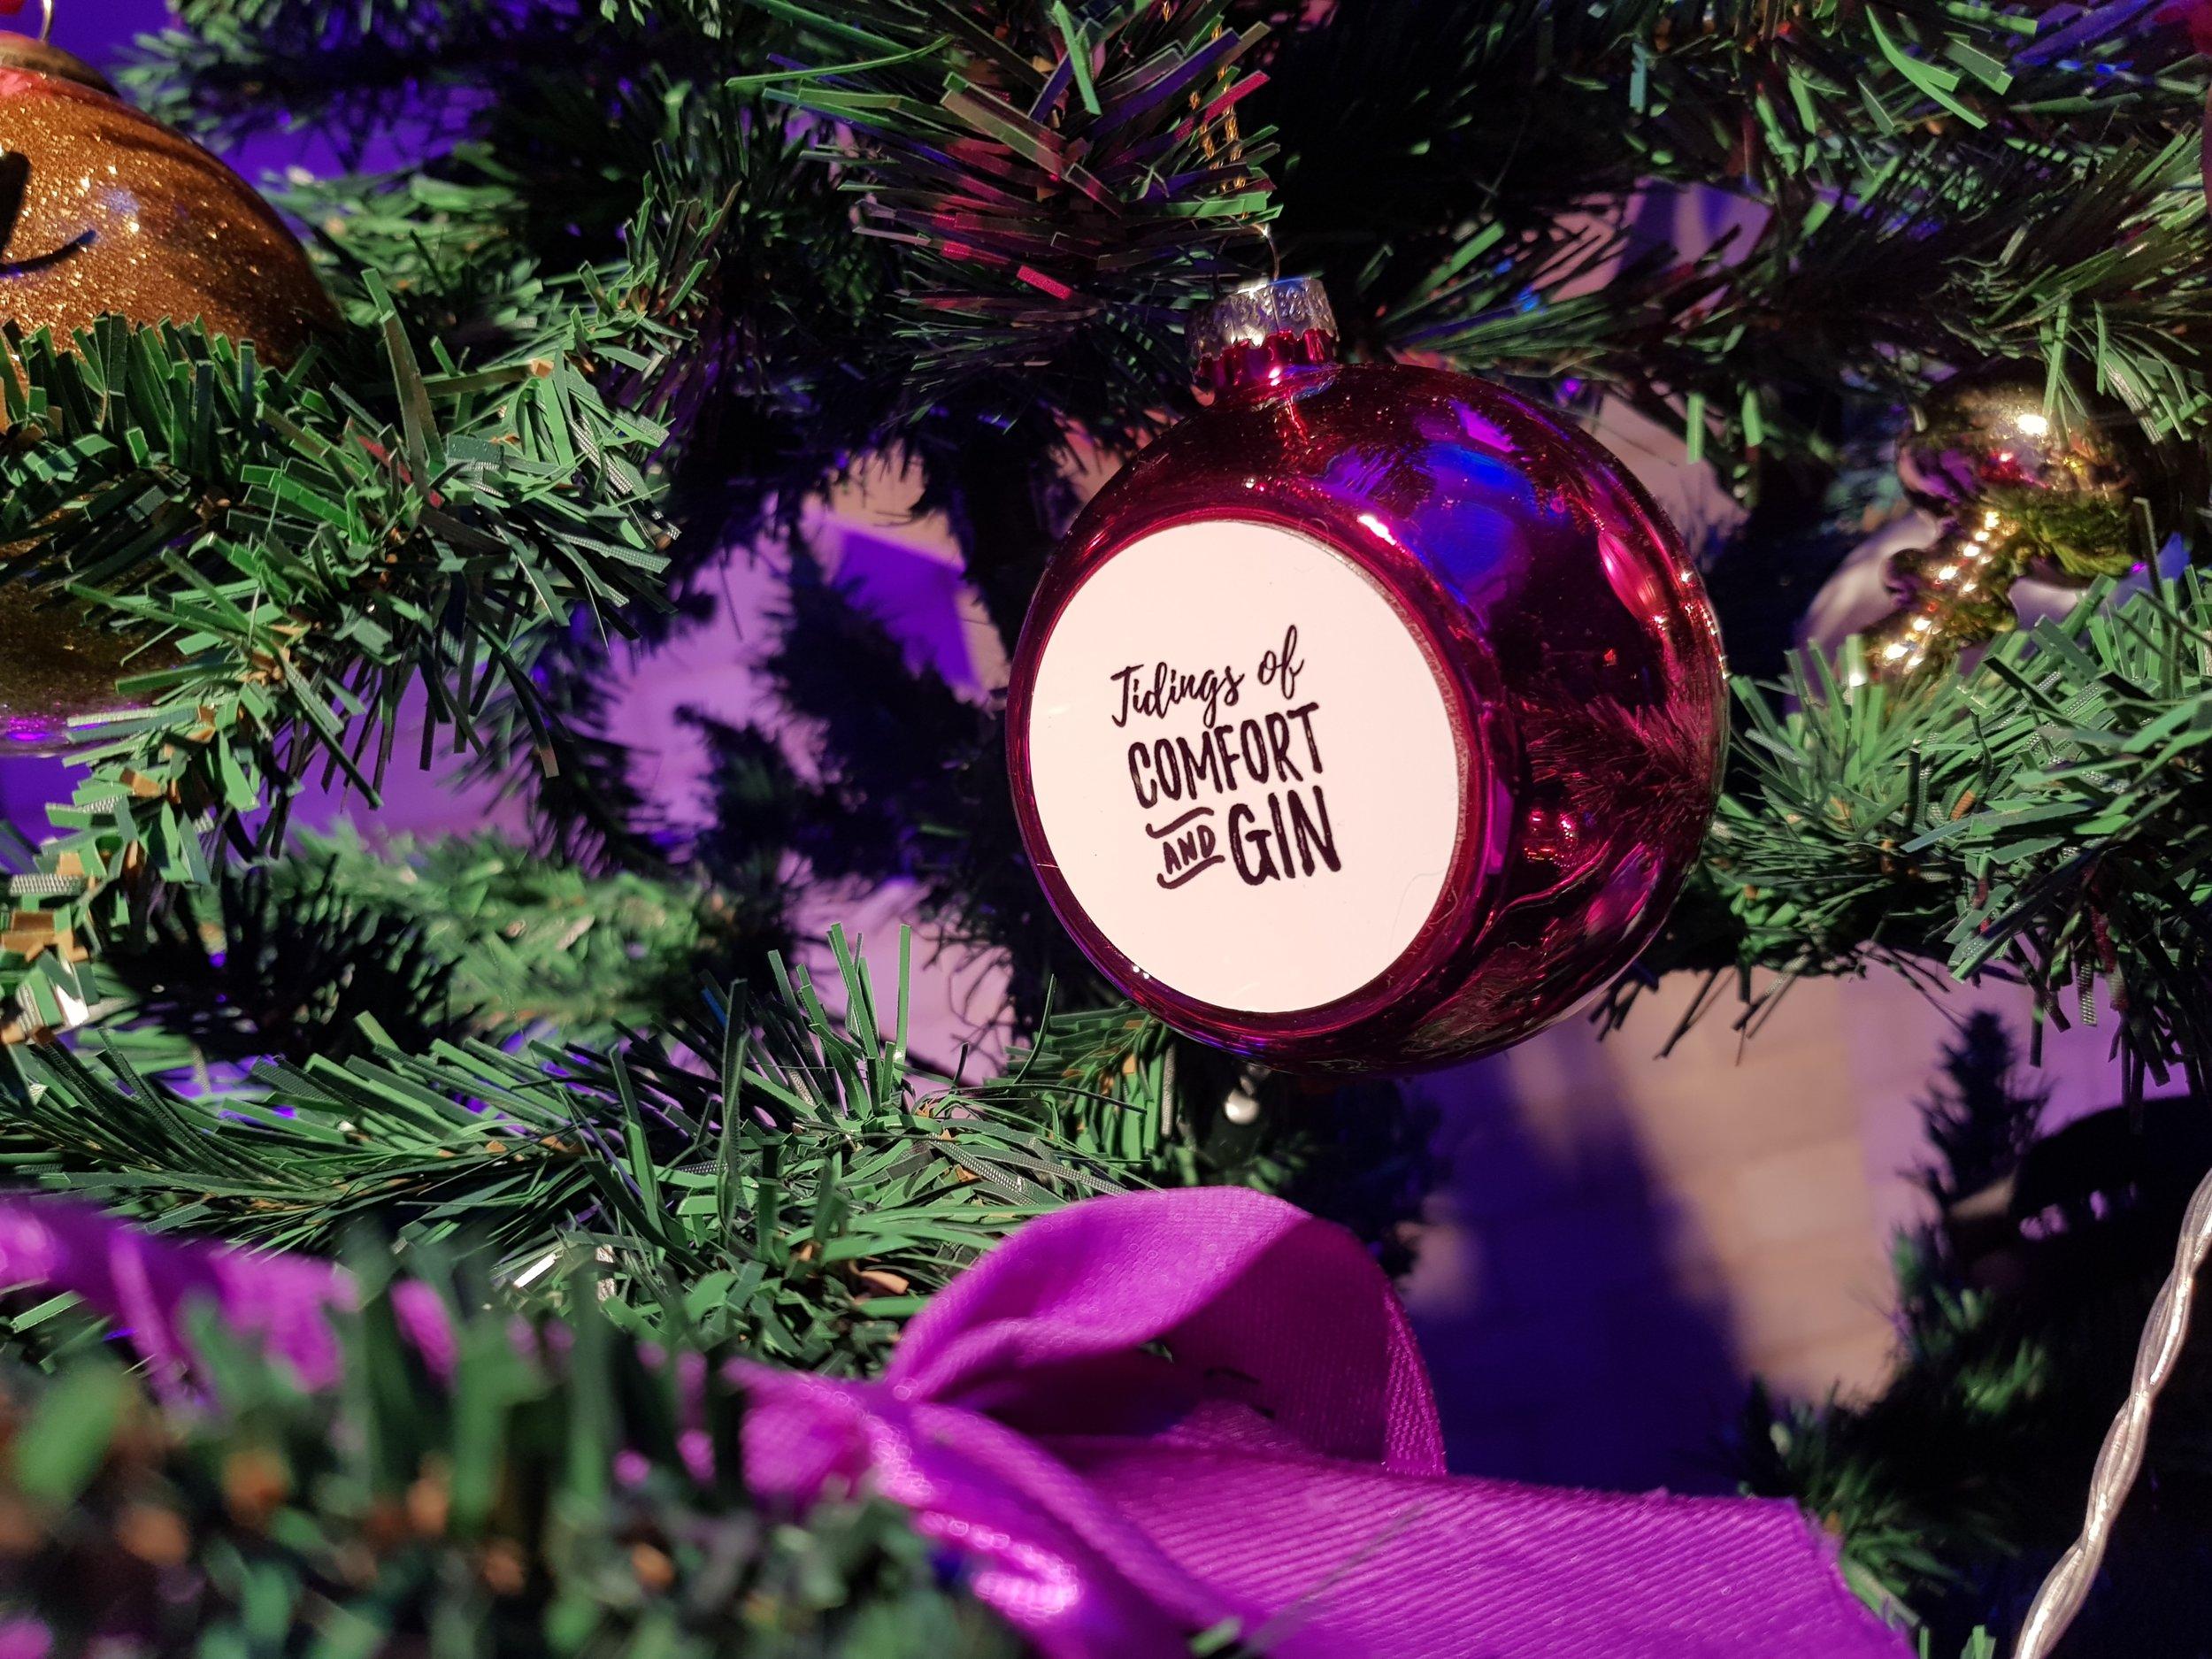 Prezzybox Jingle Mingle Tidings of Comfort and Gin bauble